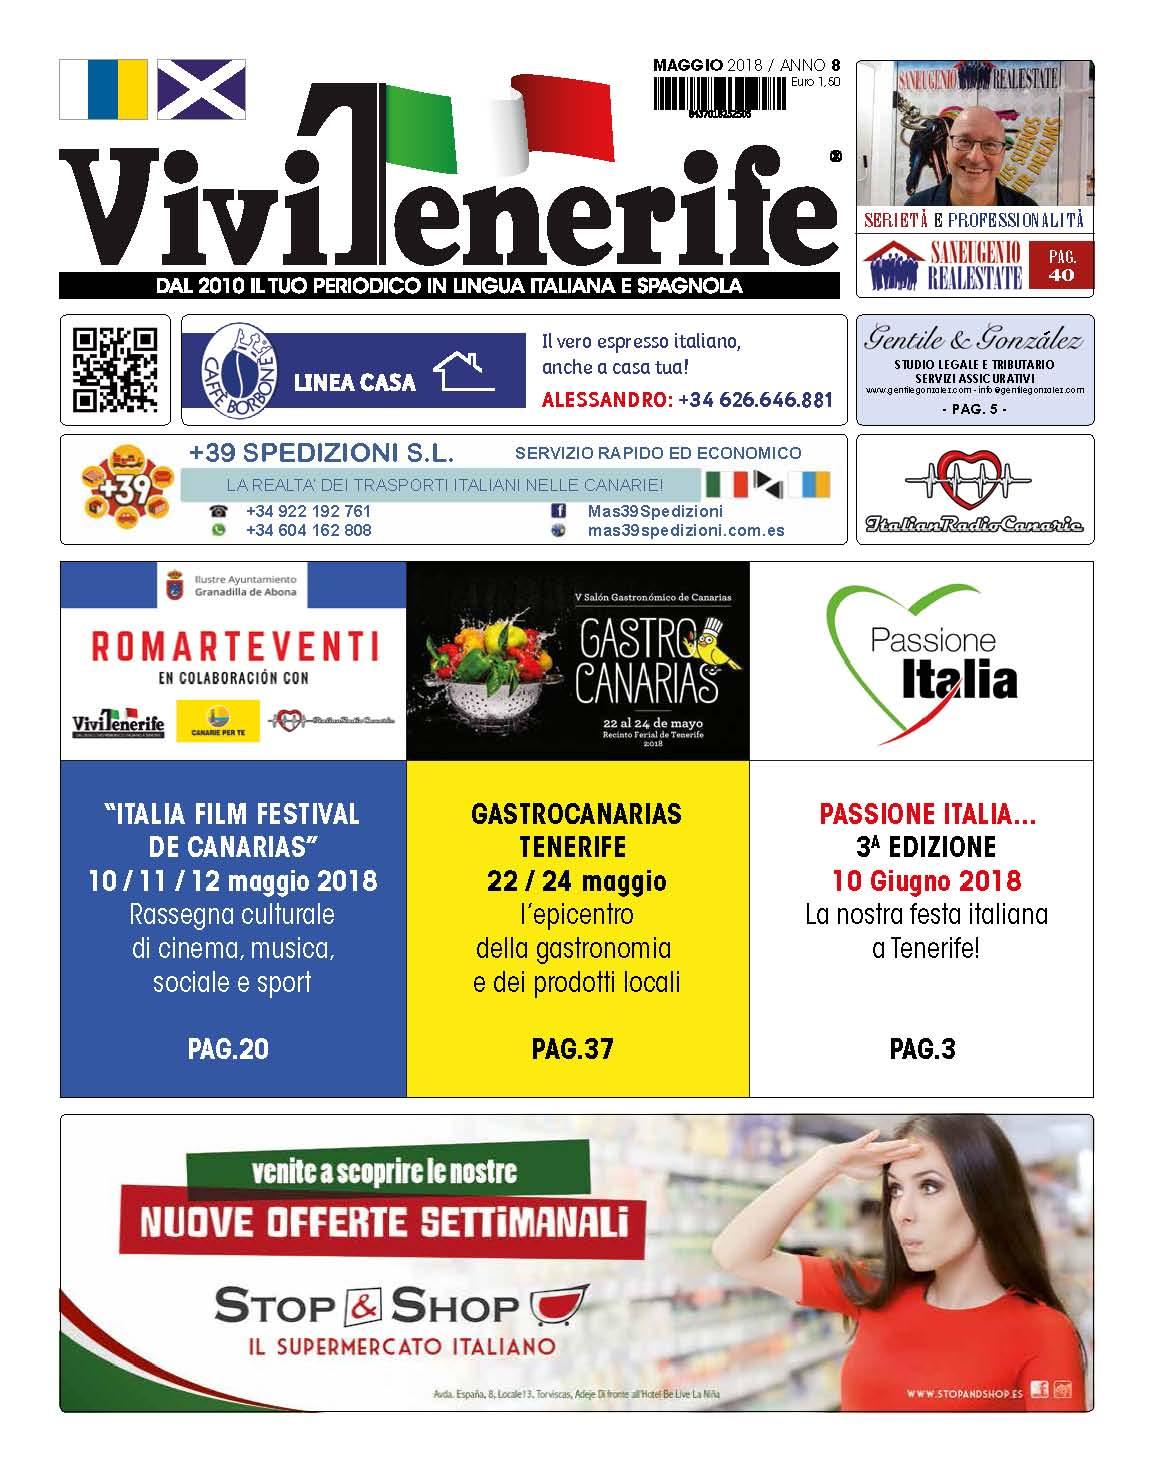 ViviTenerife Maggio 2018